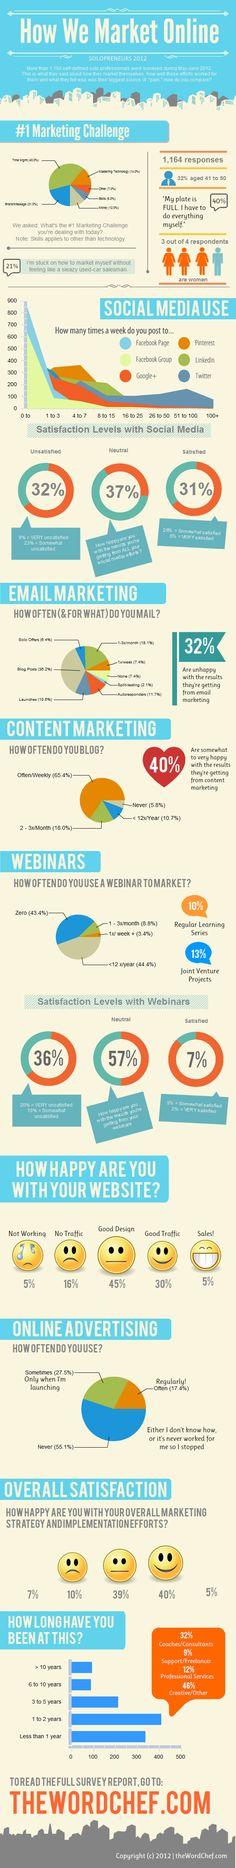 How We Market Online Infographic #infographic